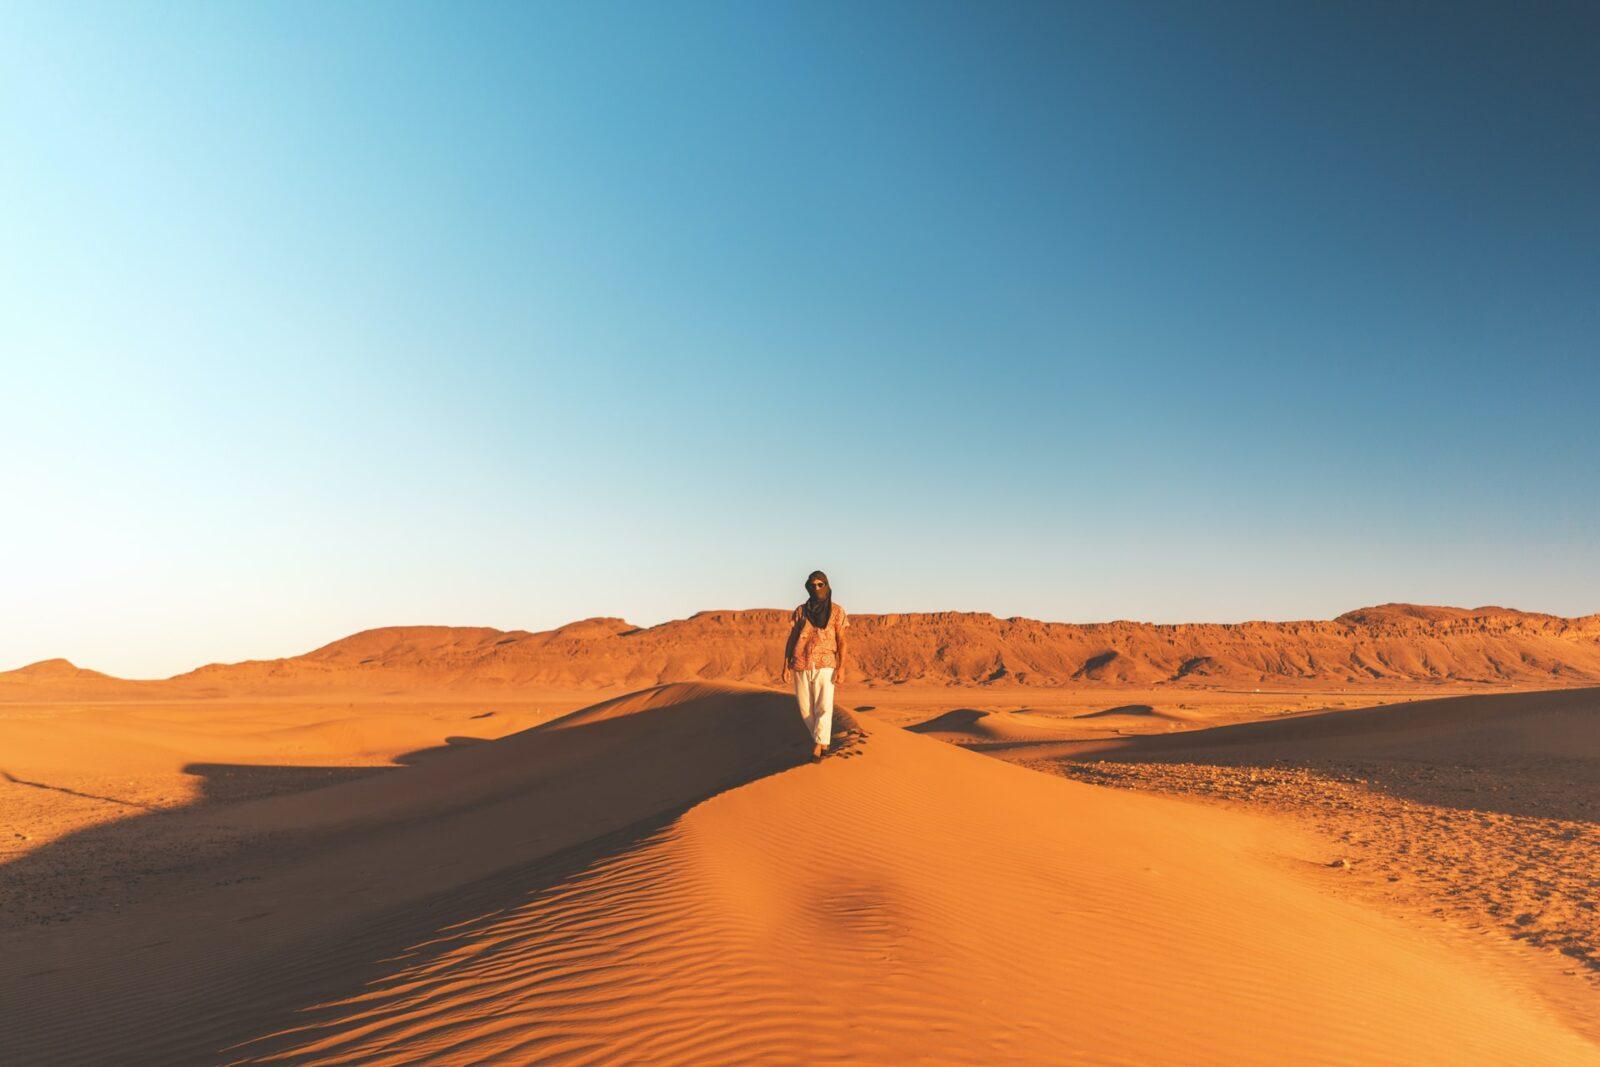 marvin meyer araXo8K1RhI unsplash 1536x1024 - Guide Morocco Tours